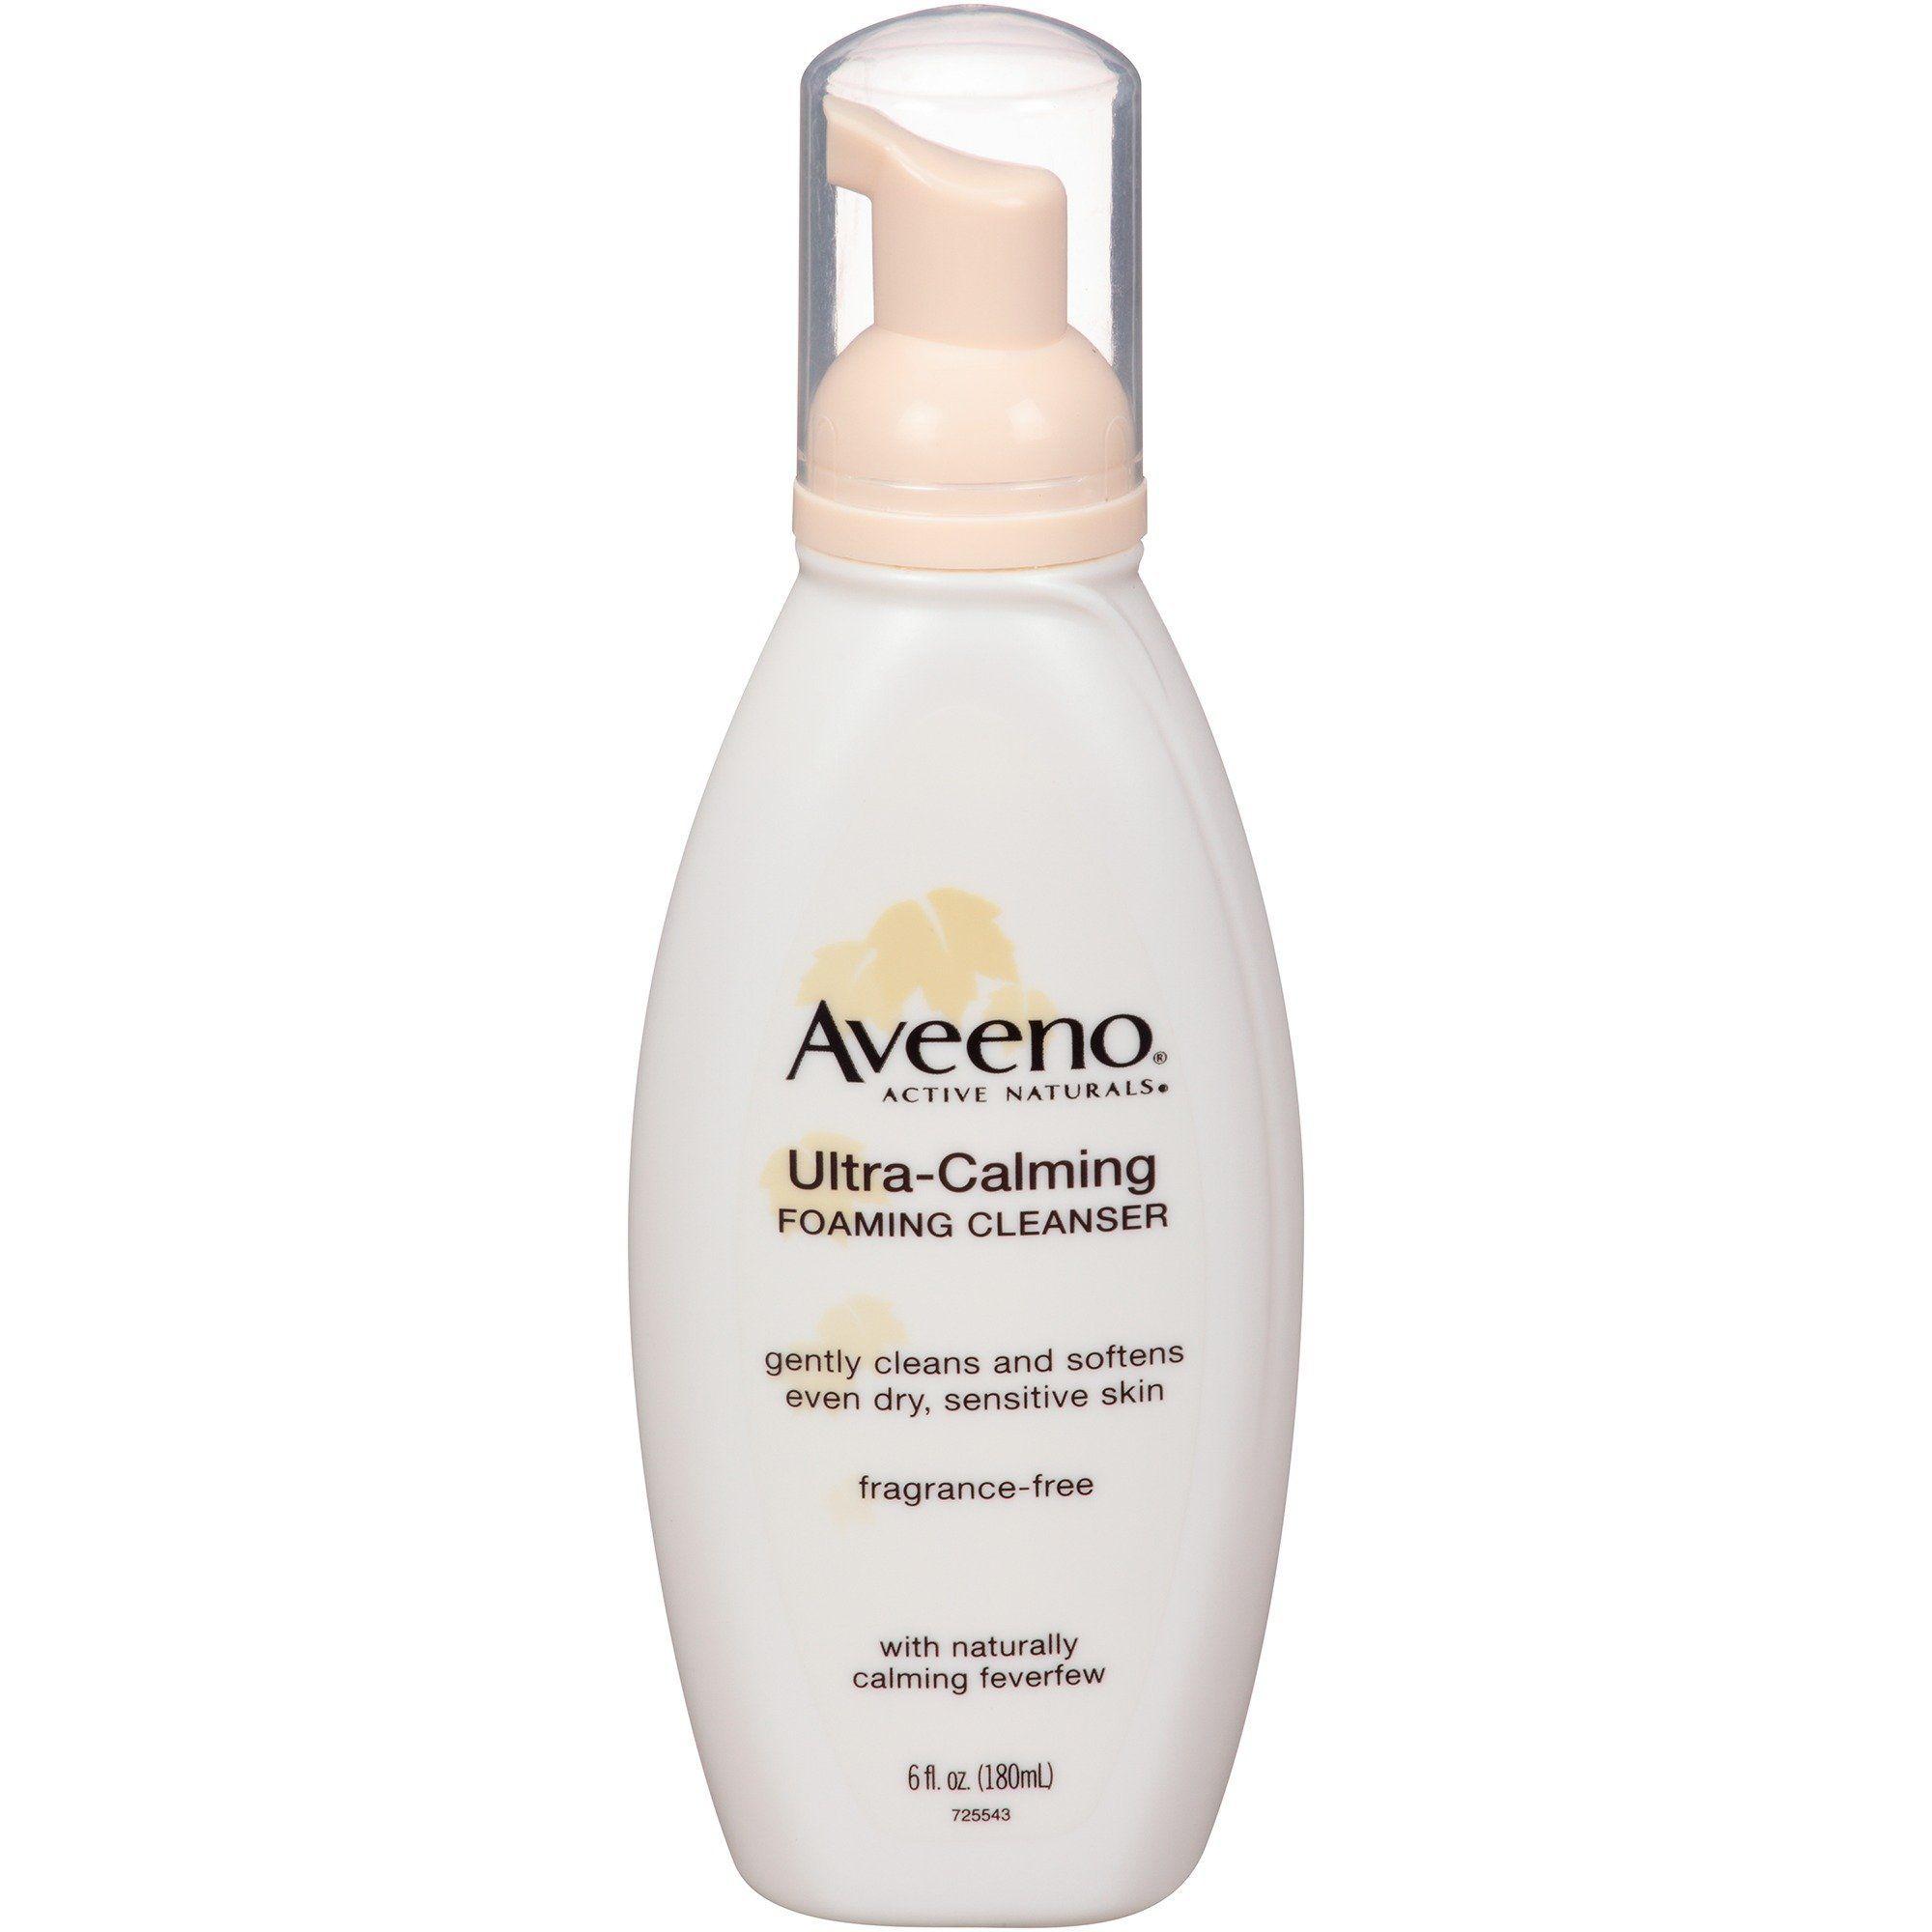 Aveeno Active Naturals UltraCalming Foaming Cleanser